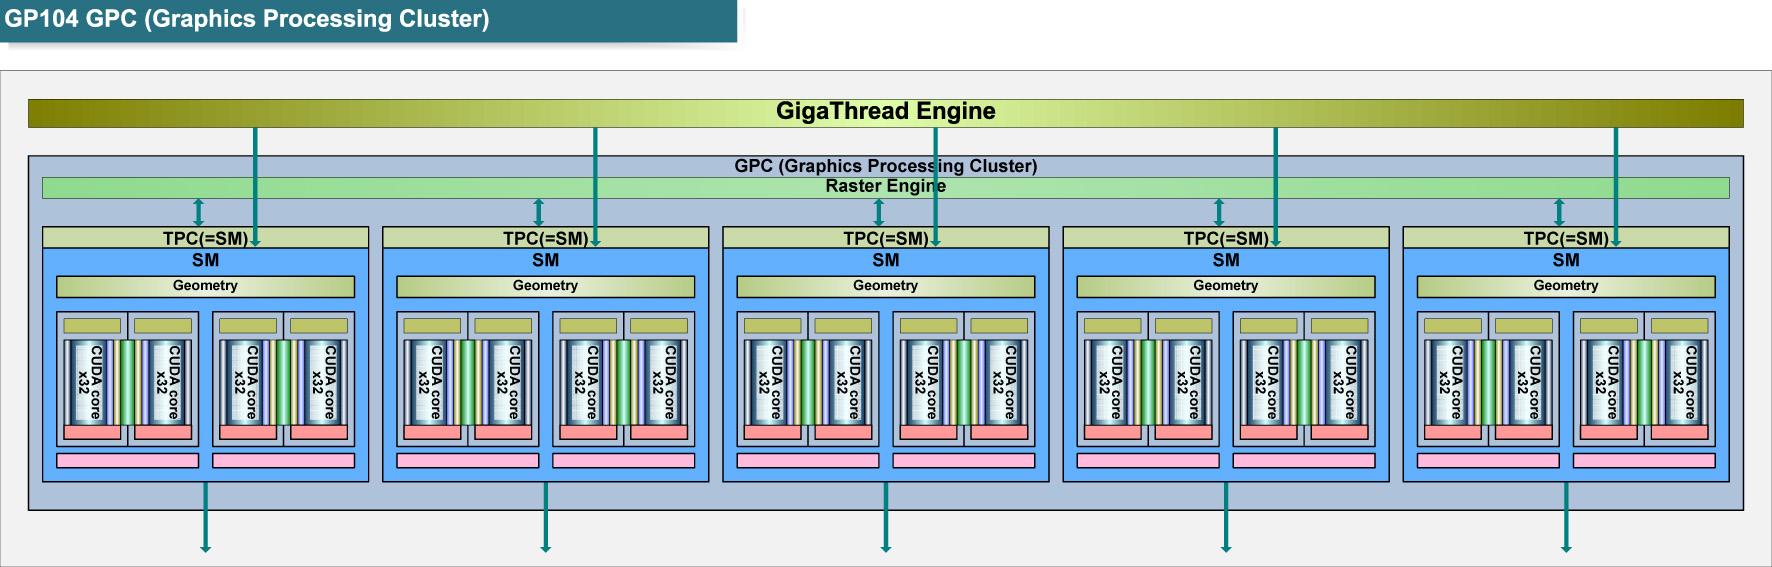 "GeForce GTX 1080(GP104)のGPCブロック図<br class="""">PDF版は<span class=""img-inline raw""><a href=""/video/pcw/docs/757/916/p16.pdf"" ipw_status=""1"" ipw_linktype=""filelink_raw"" class=""resource"">こちら</a></span>"